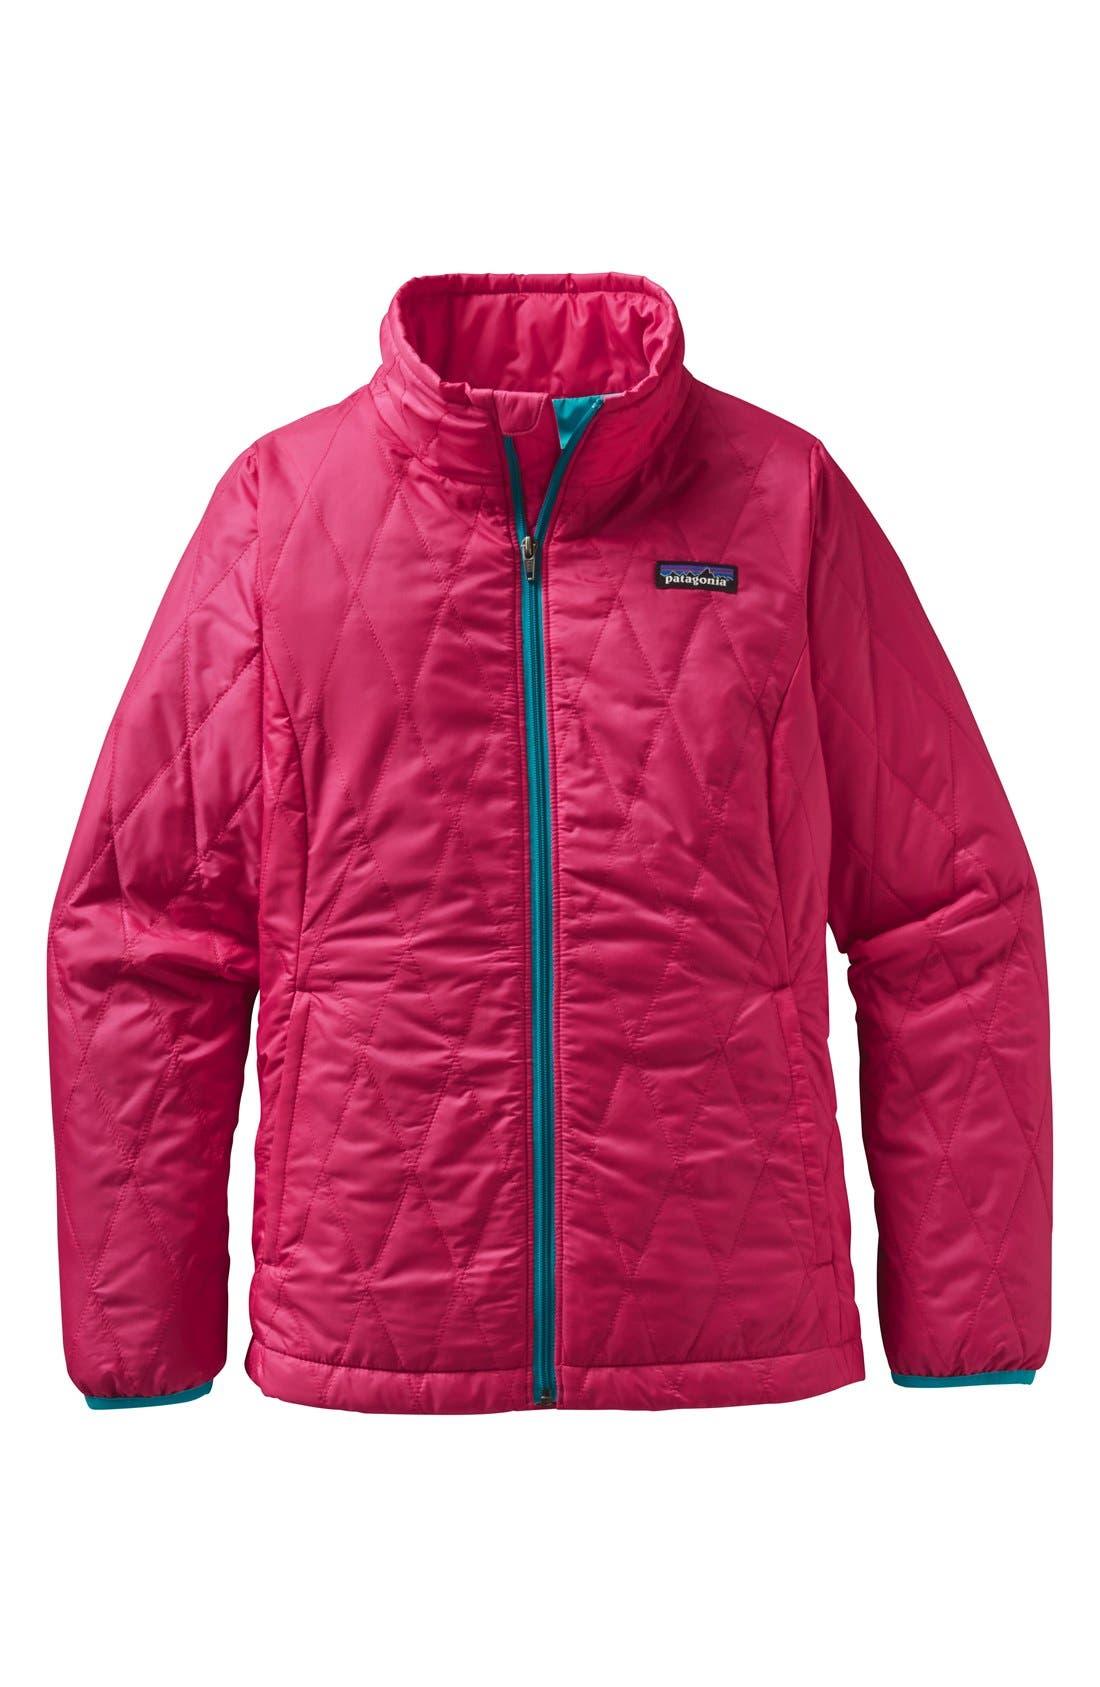 Alternate Image 1 Selected - Patagonia 'Nano Puff' Wind Resistant & Water Repellent Jacket (Little Girls & Big Girls)